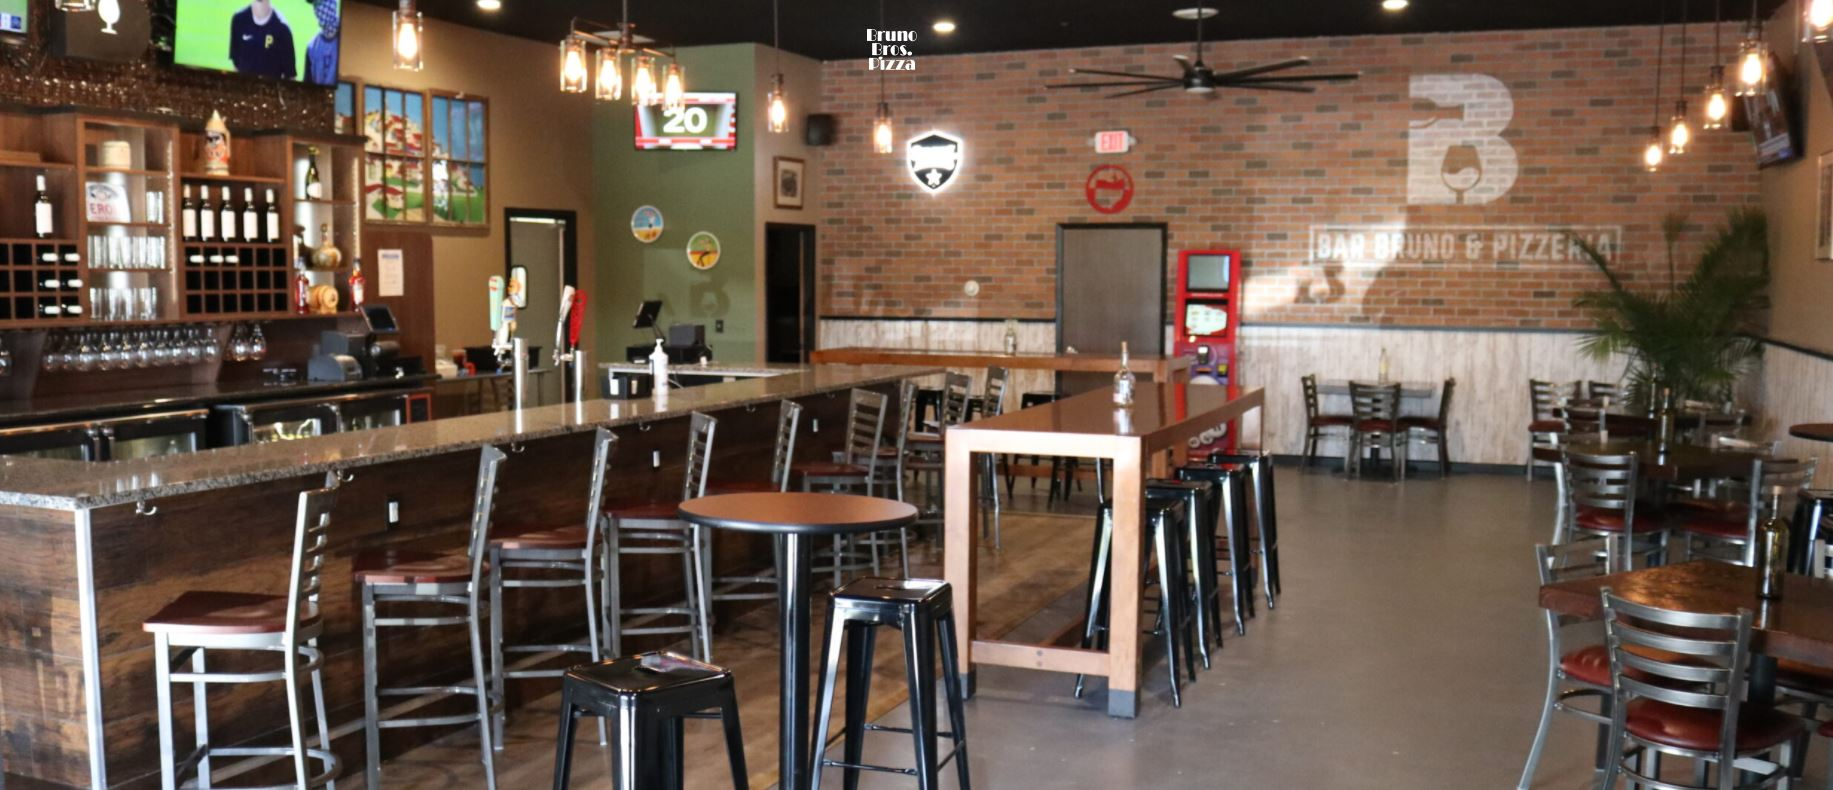 Bar Bruno & Pizzeria